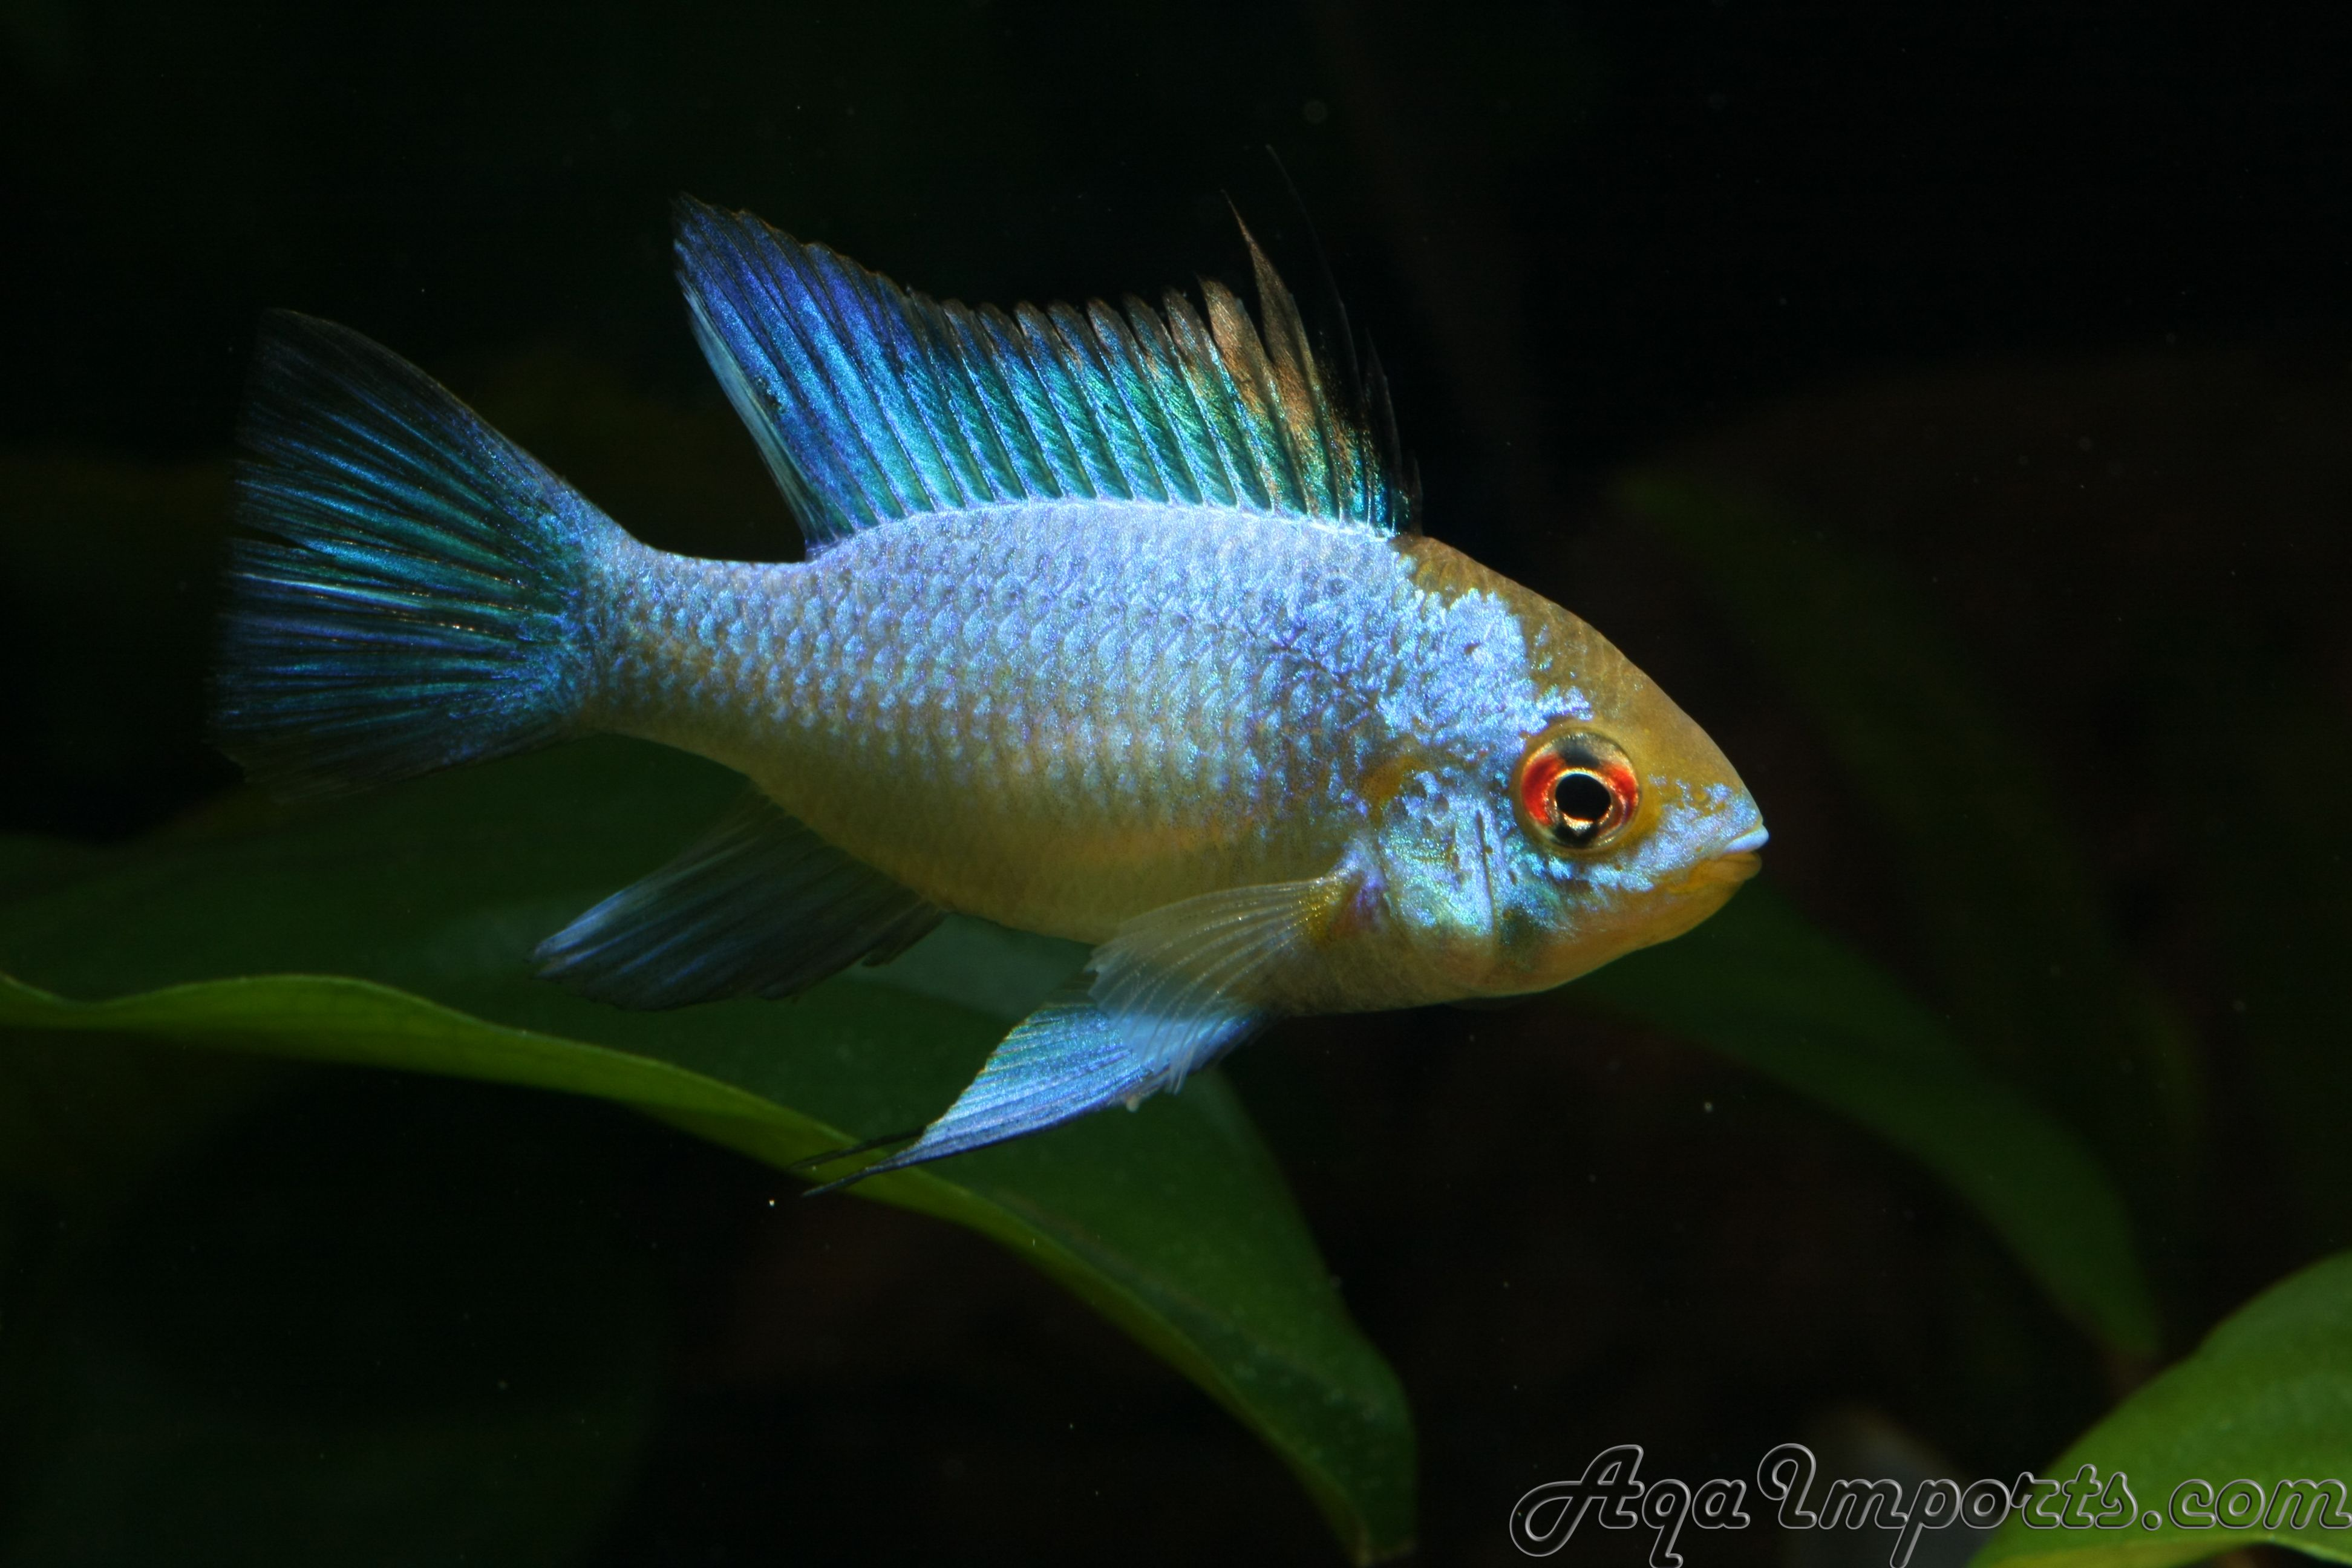 Freshwater aquarium fish gobiidae - Electric Blue Ram